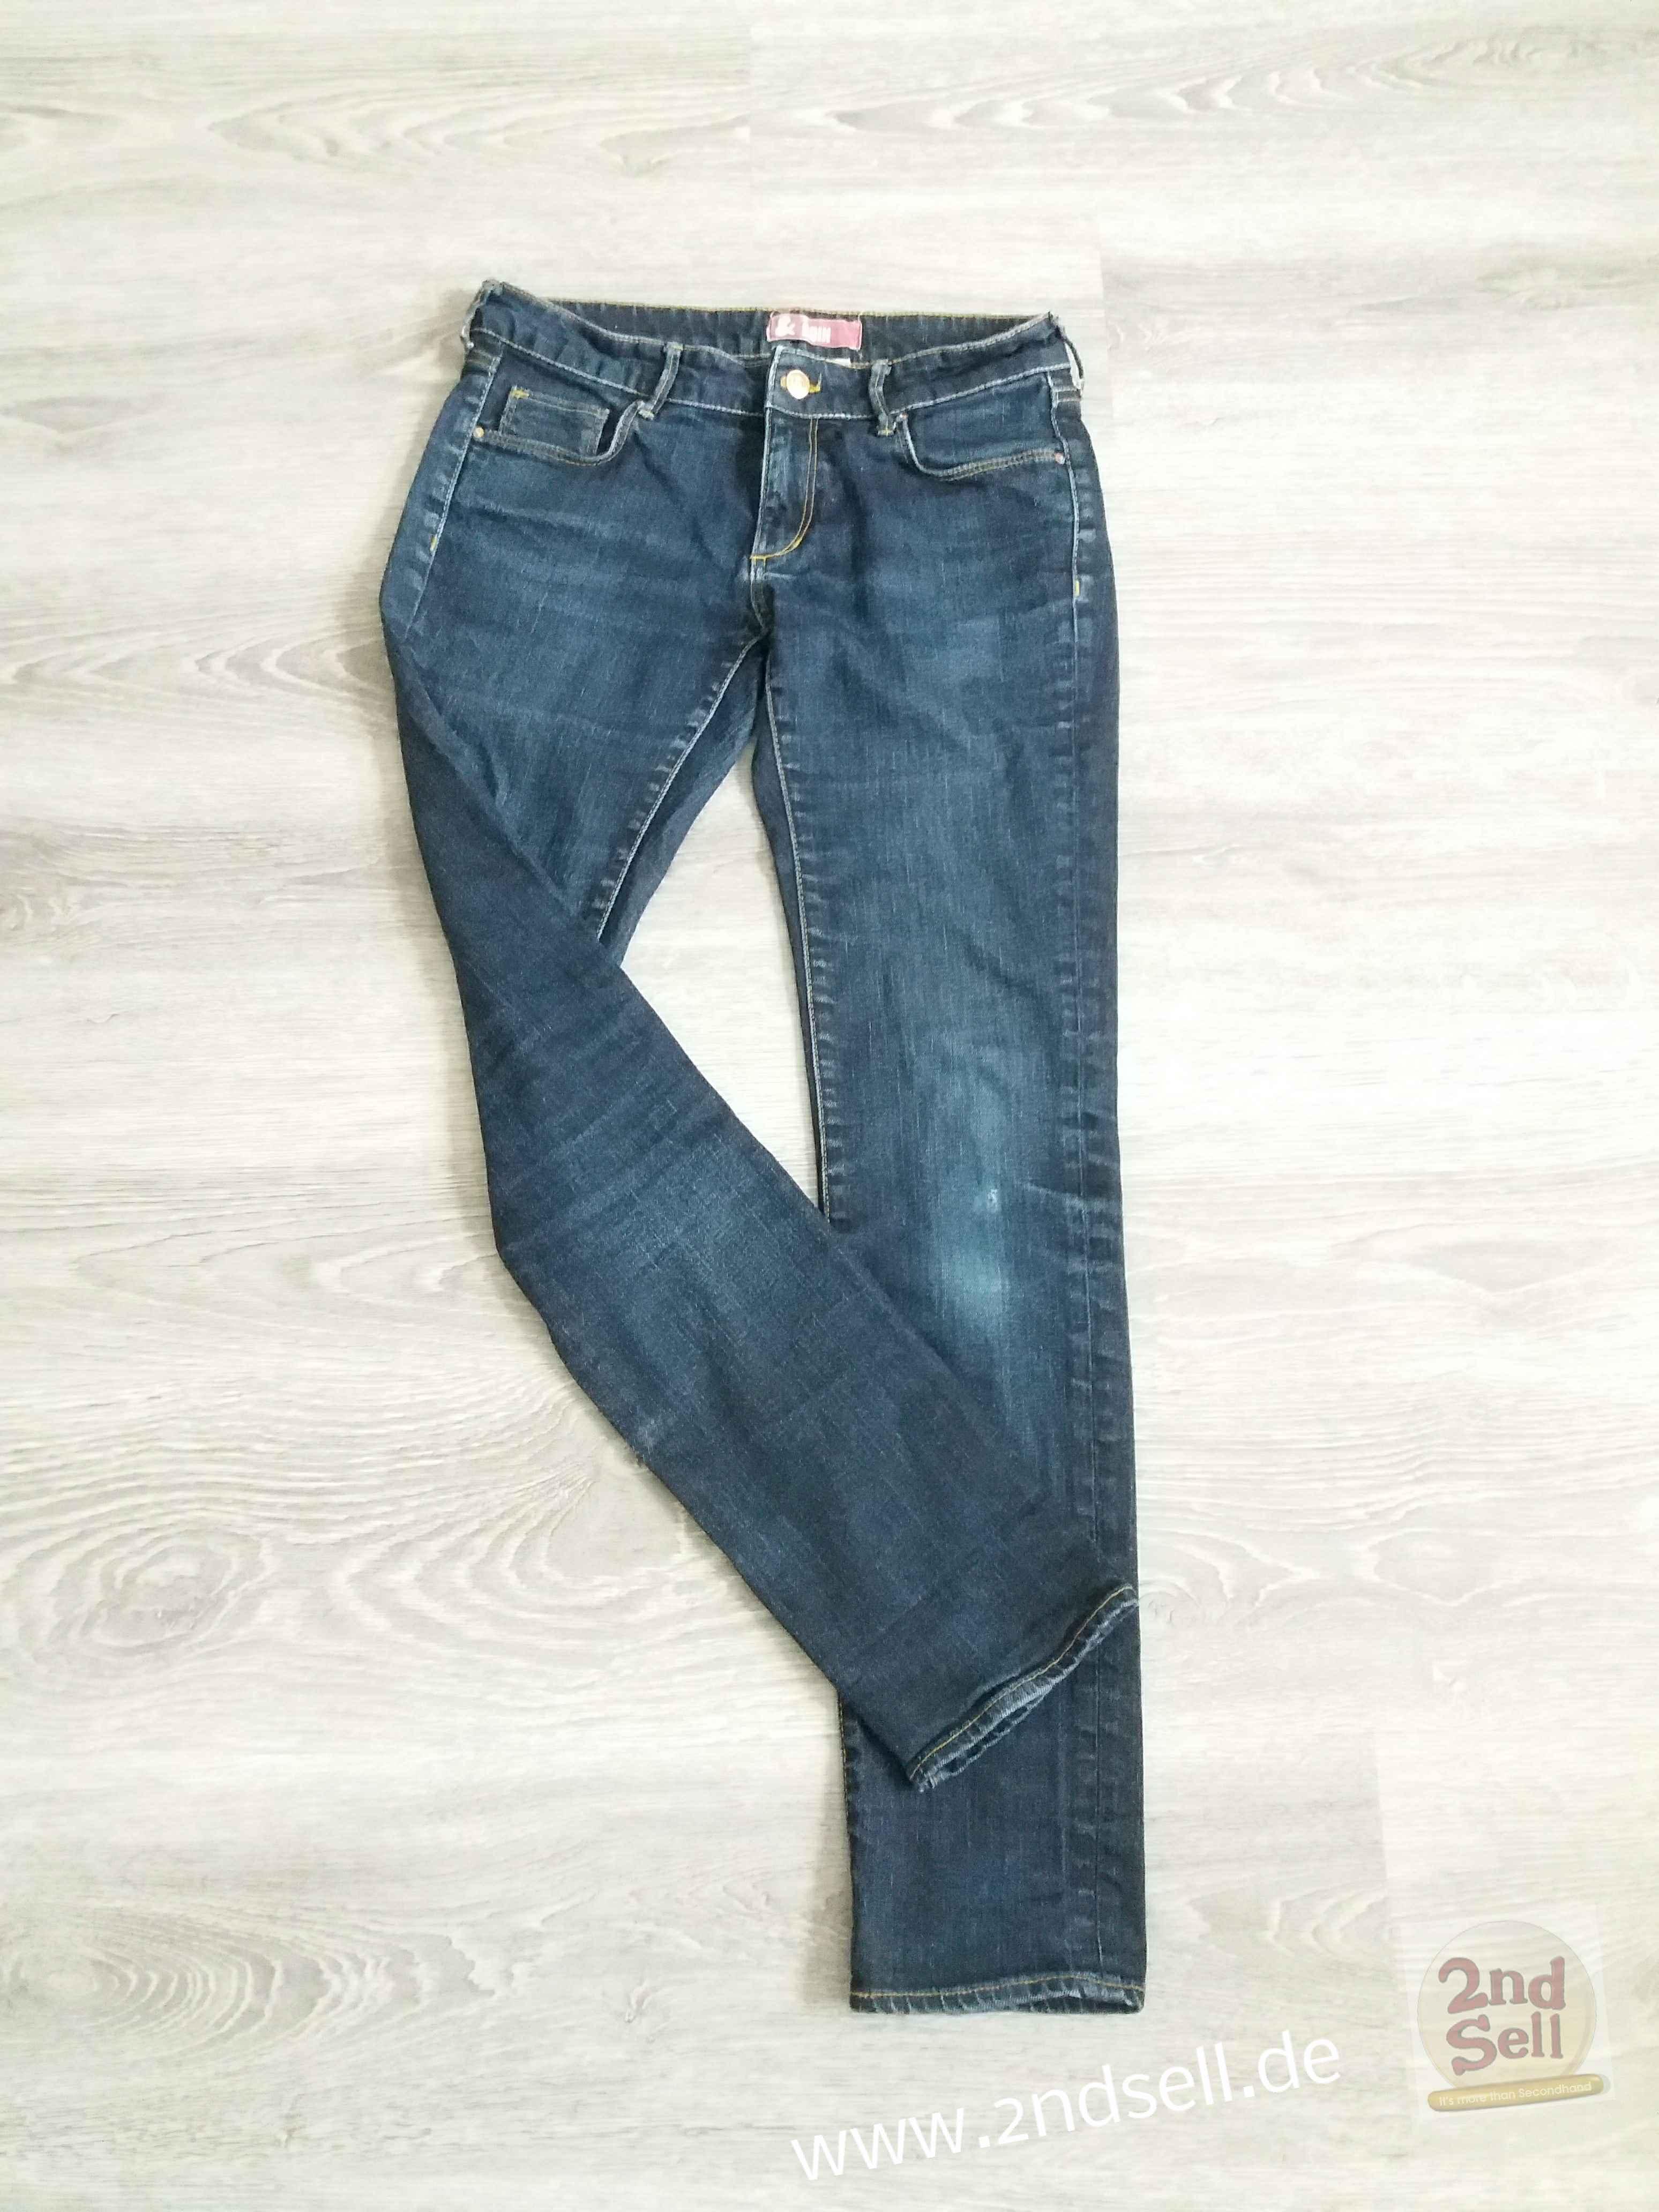 Jeans Gr. 36 H&M